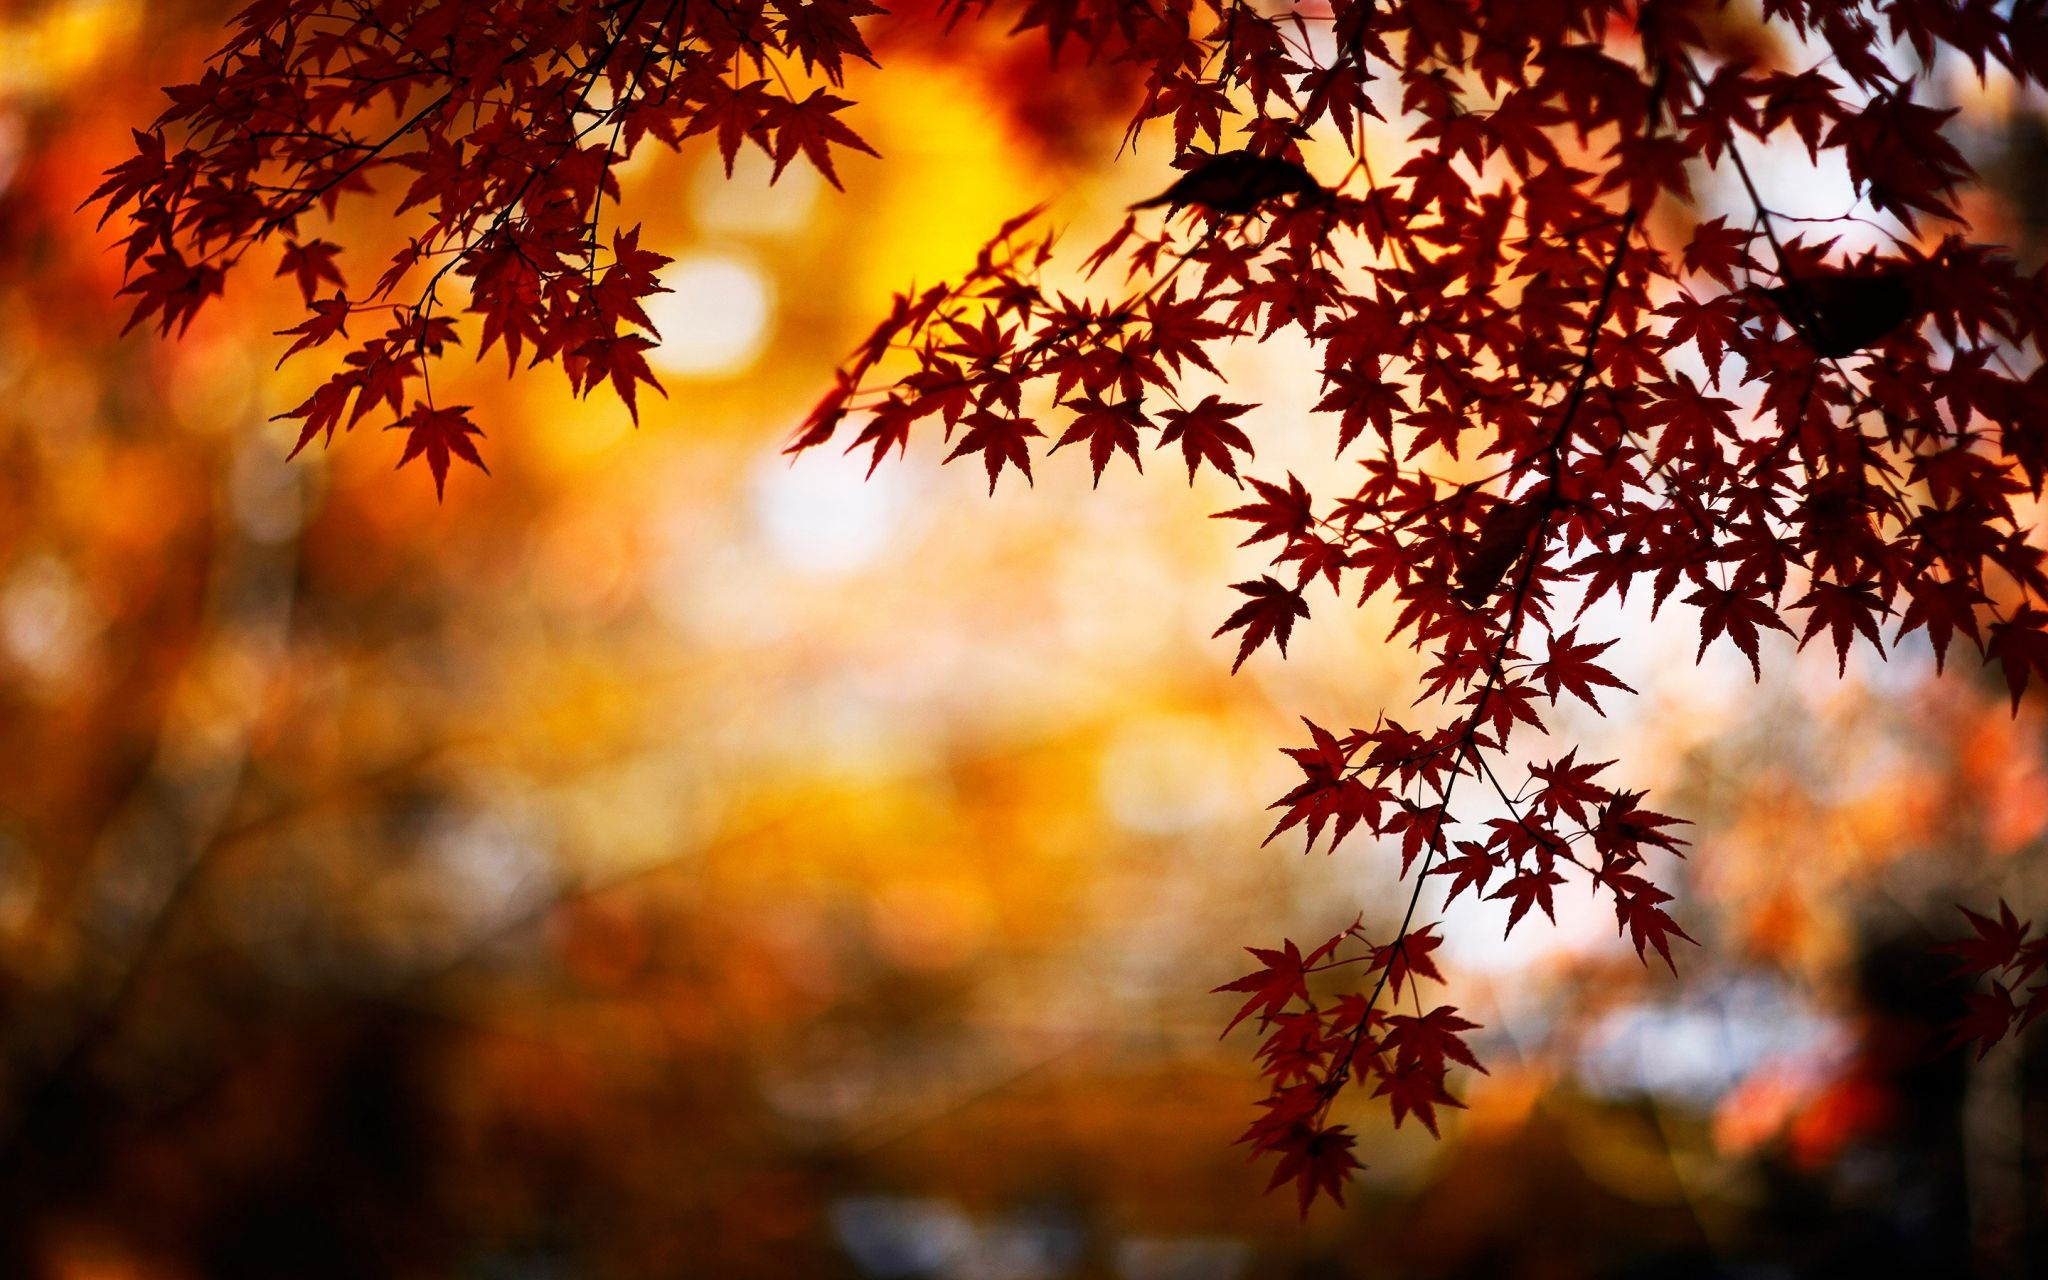 Autumn Images For Backgrounds Desktop Free Bokeh Wallpaper Desktop Wallpaper Fall Autumn Leaves Wallpaper